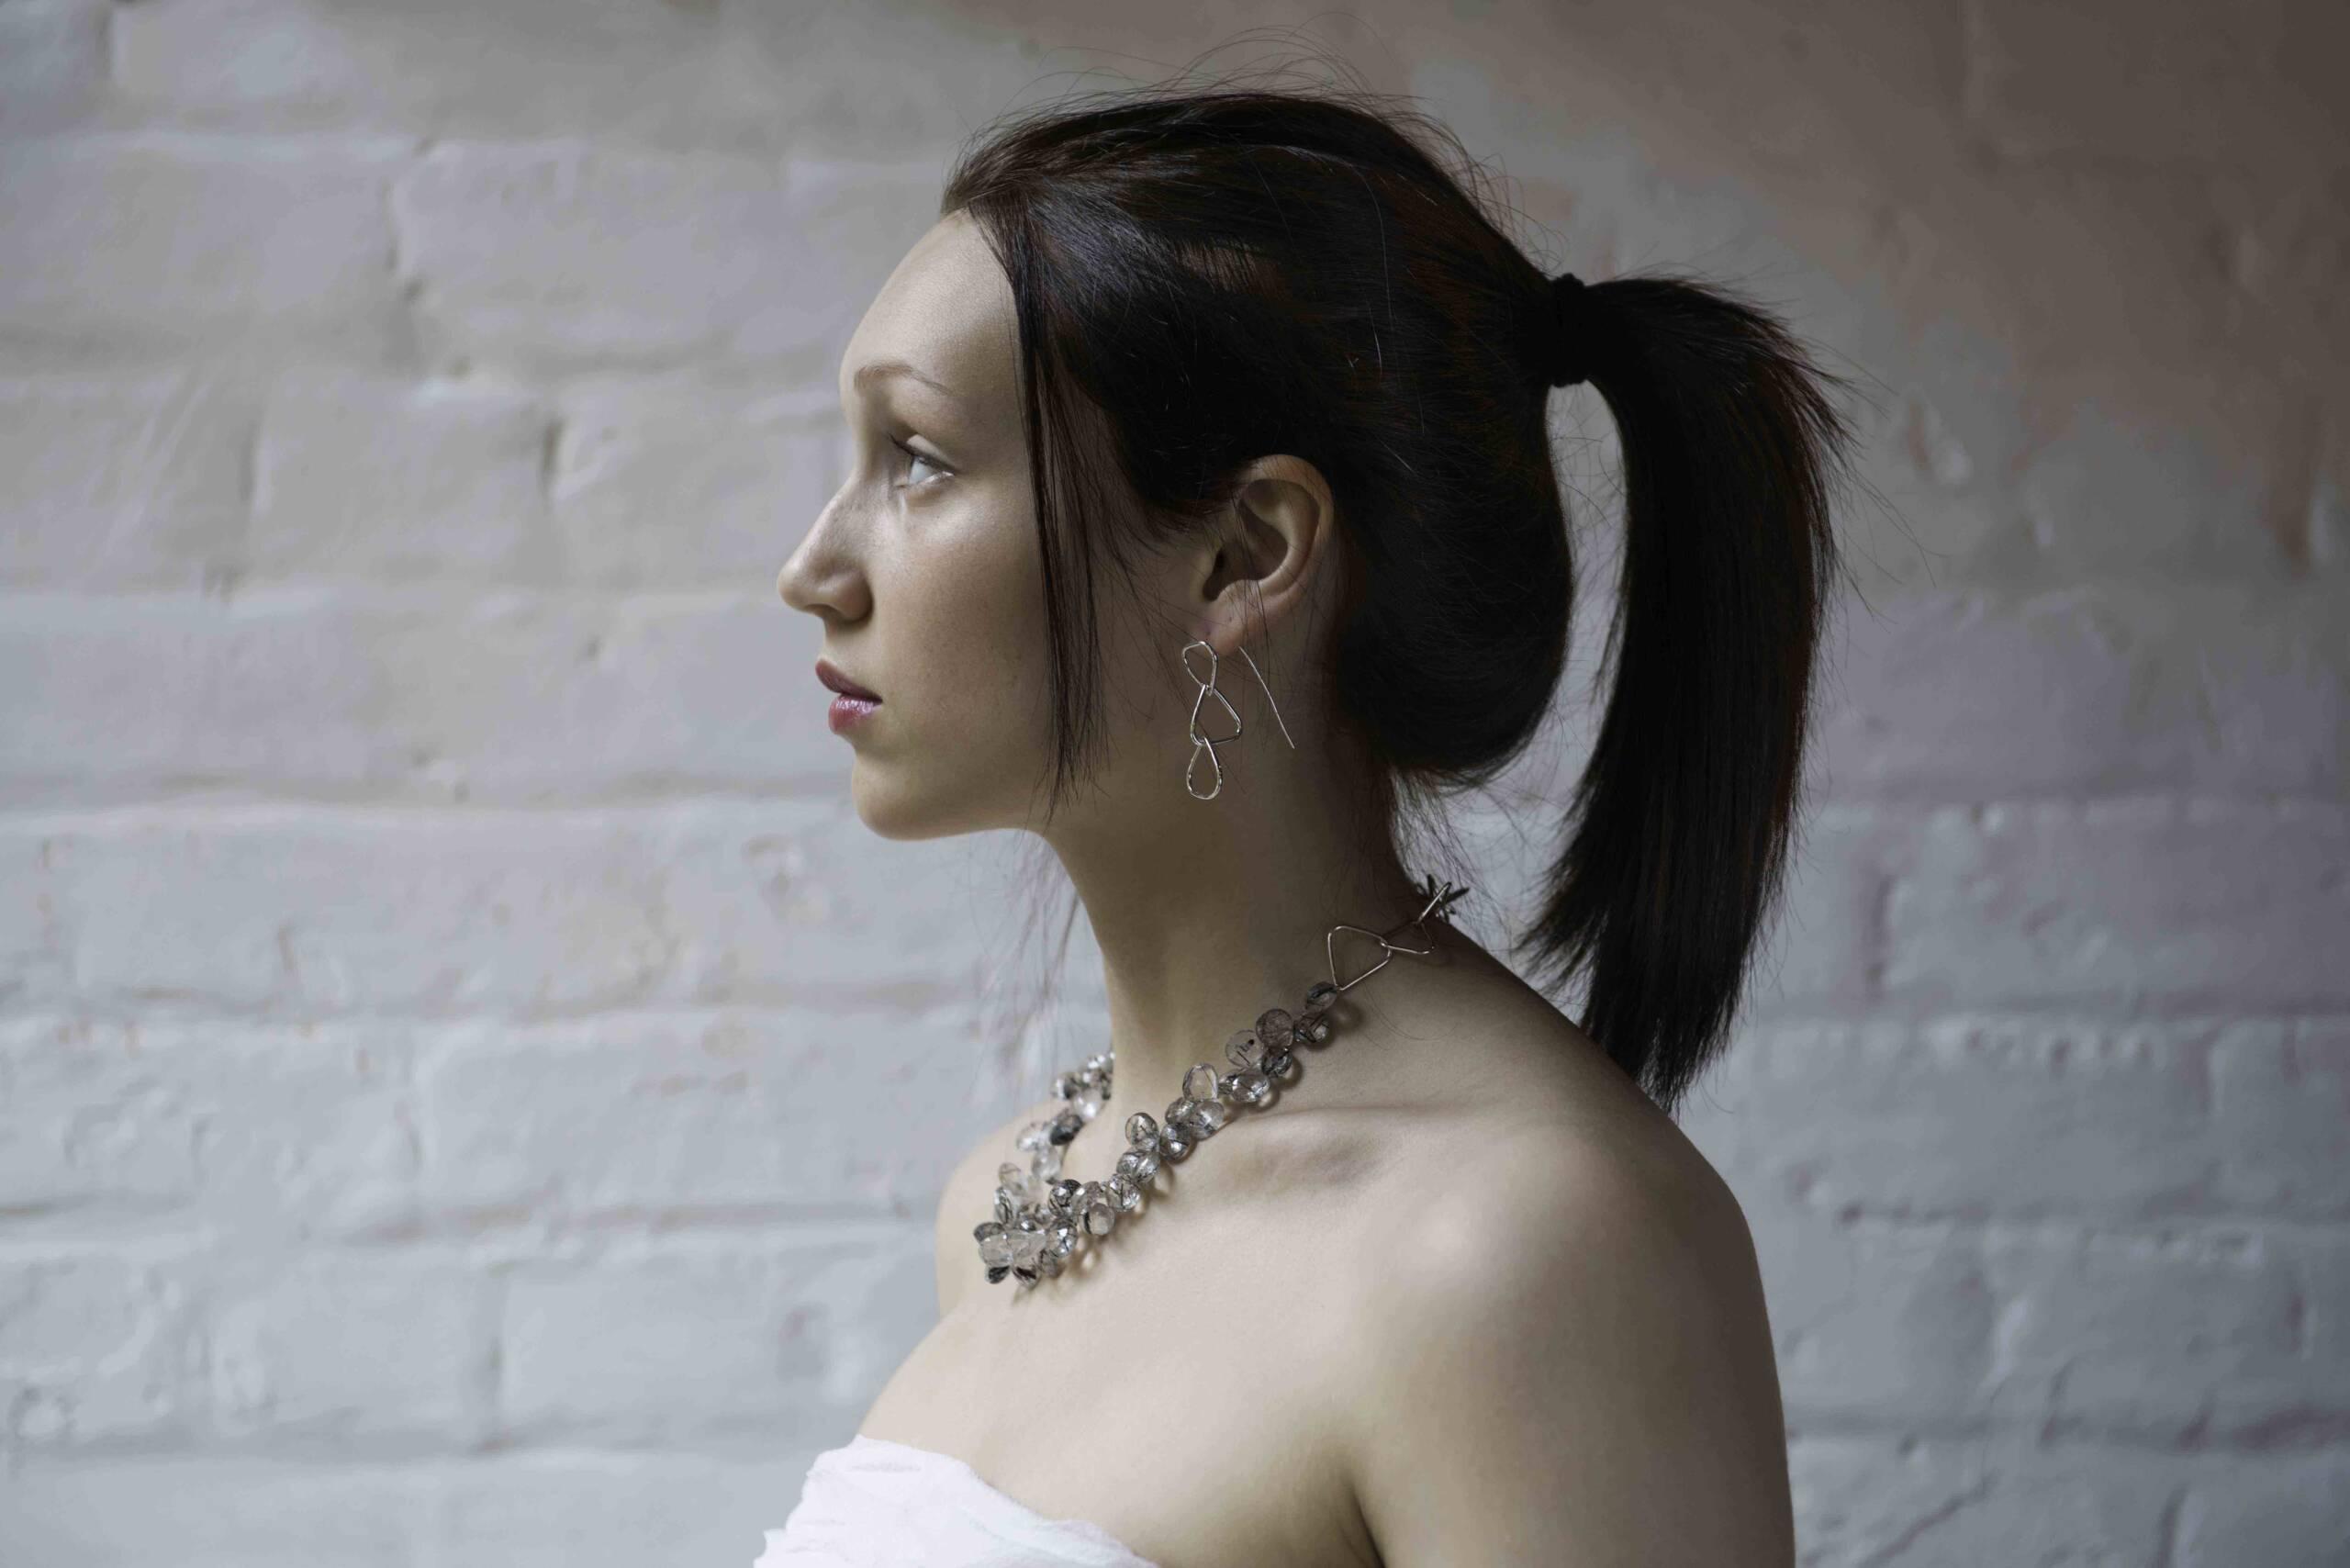 https://www.gennadelaney.com/wp-content/uploads/2021/06/GillMair-TQpear-linked-neckpiece-sm-scaled.jpg